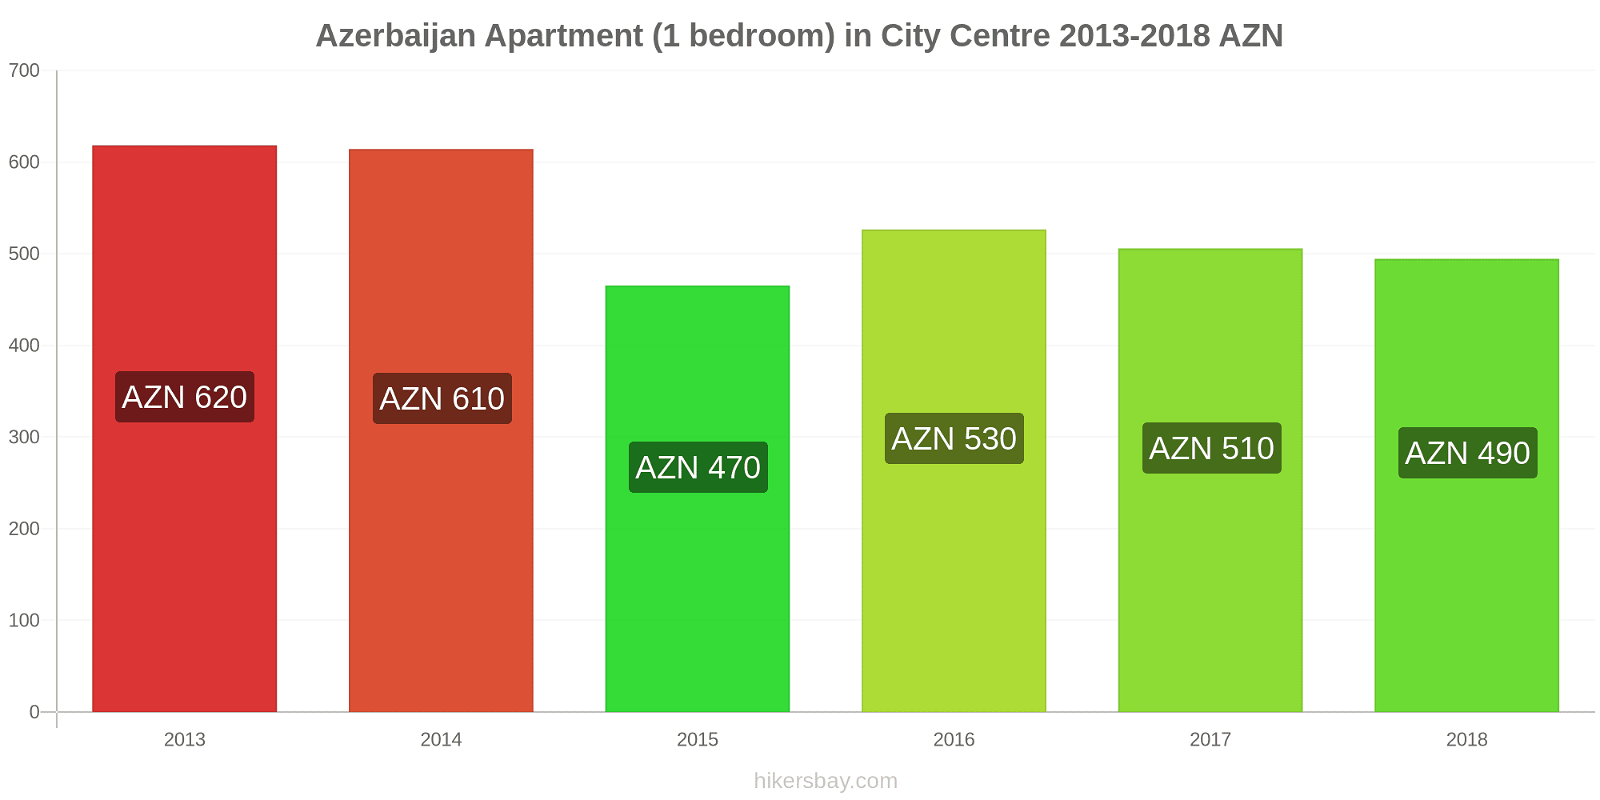 Azerbaijan price changes Apartment (1 bedroom) in City Centre hikersbay.com